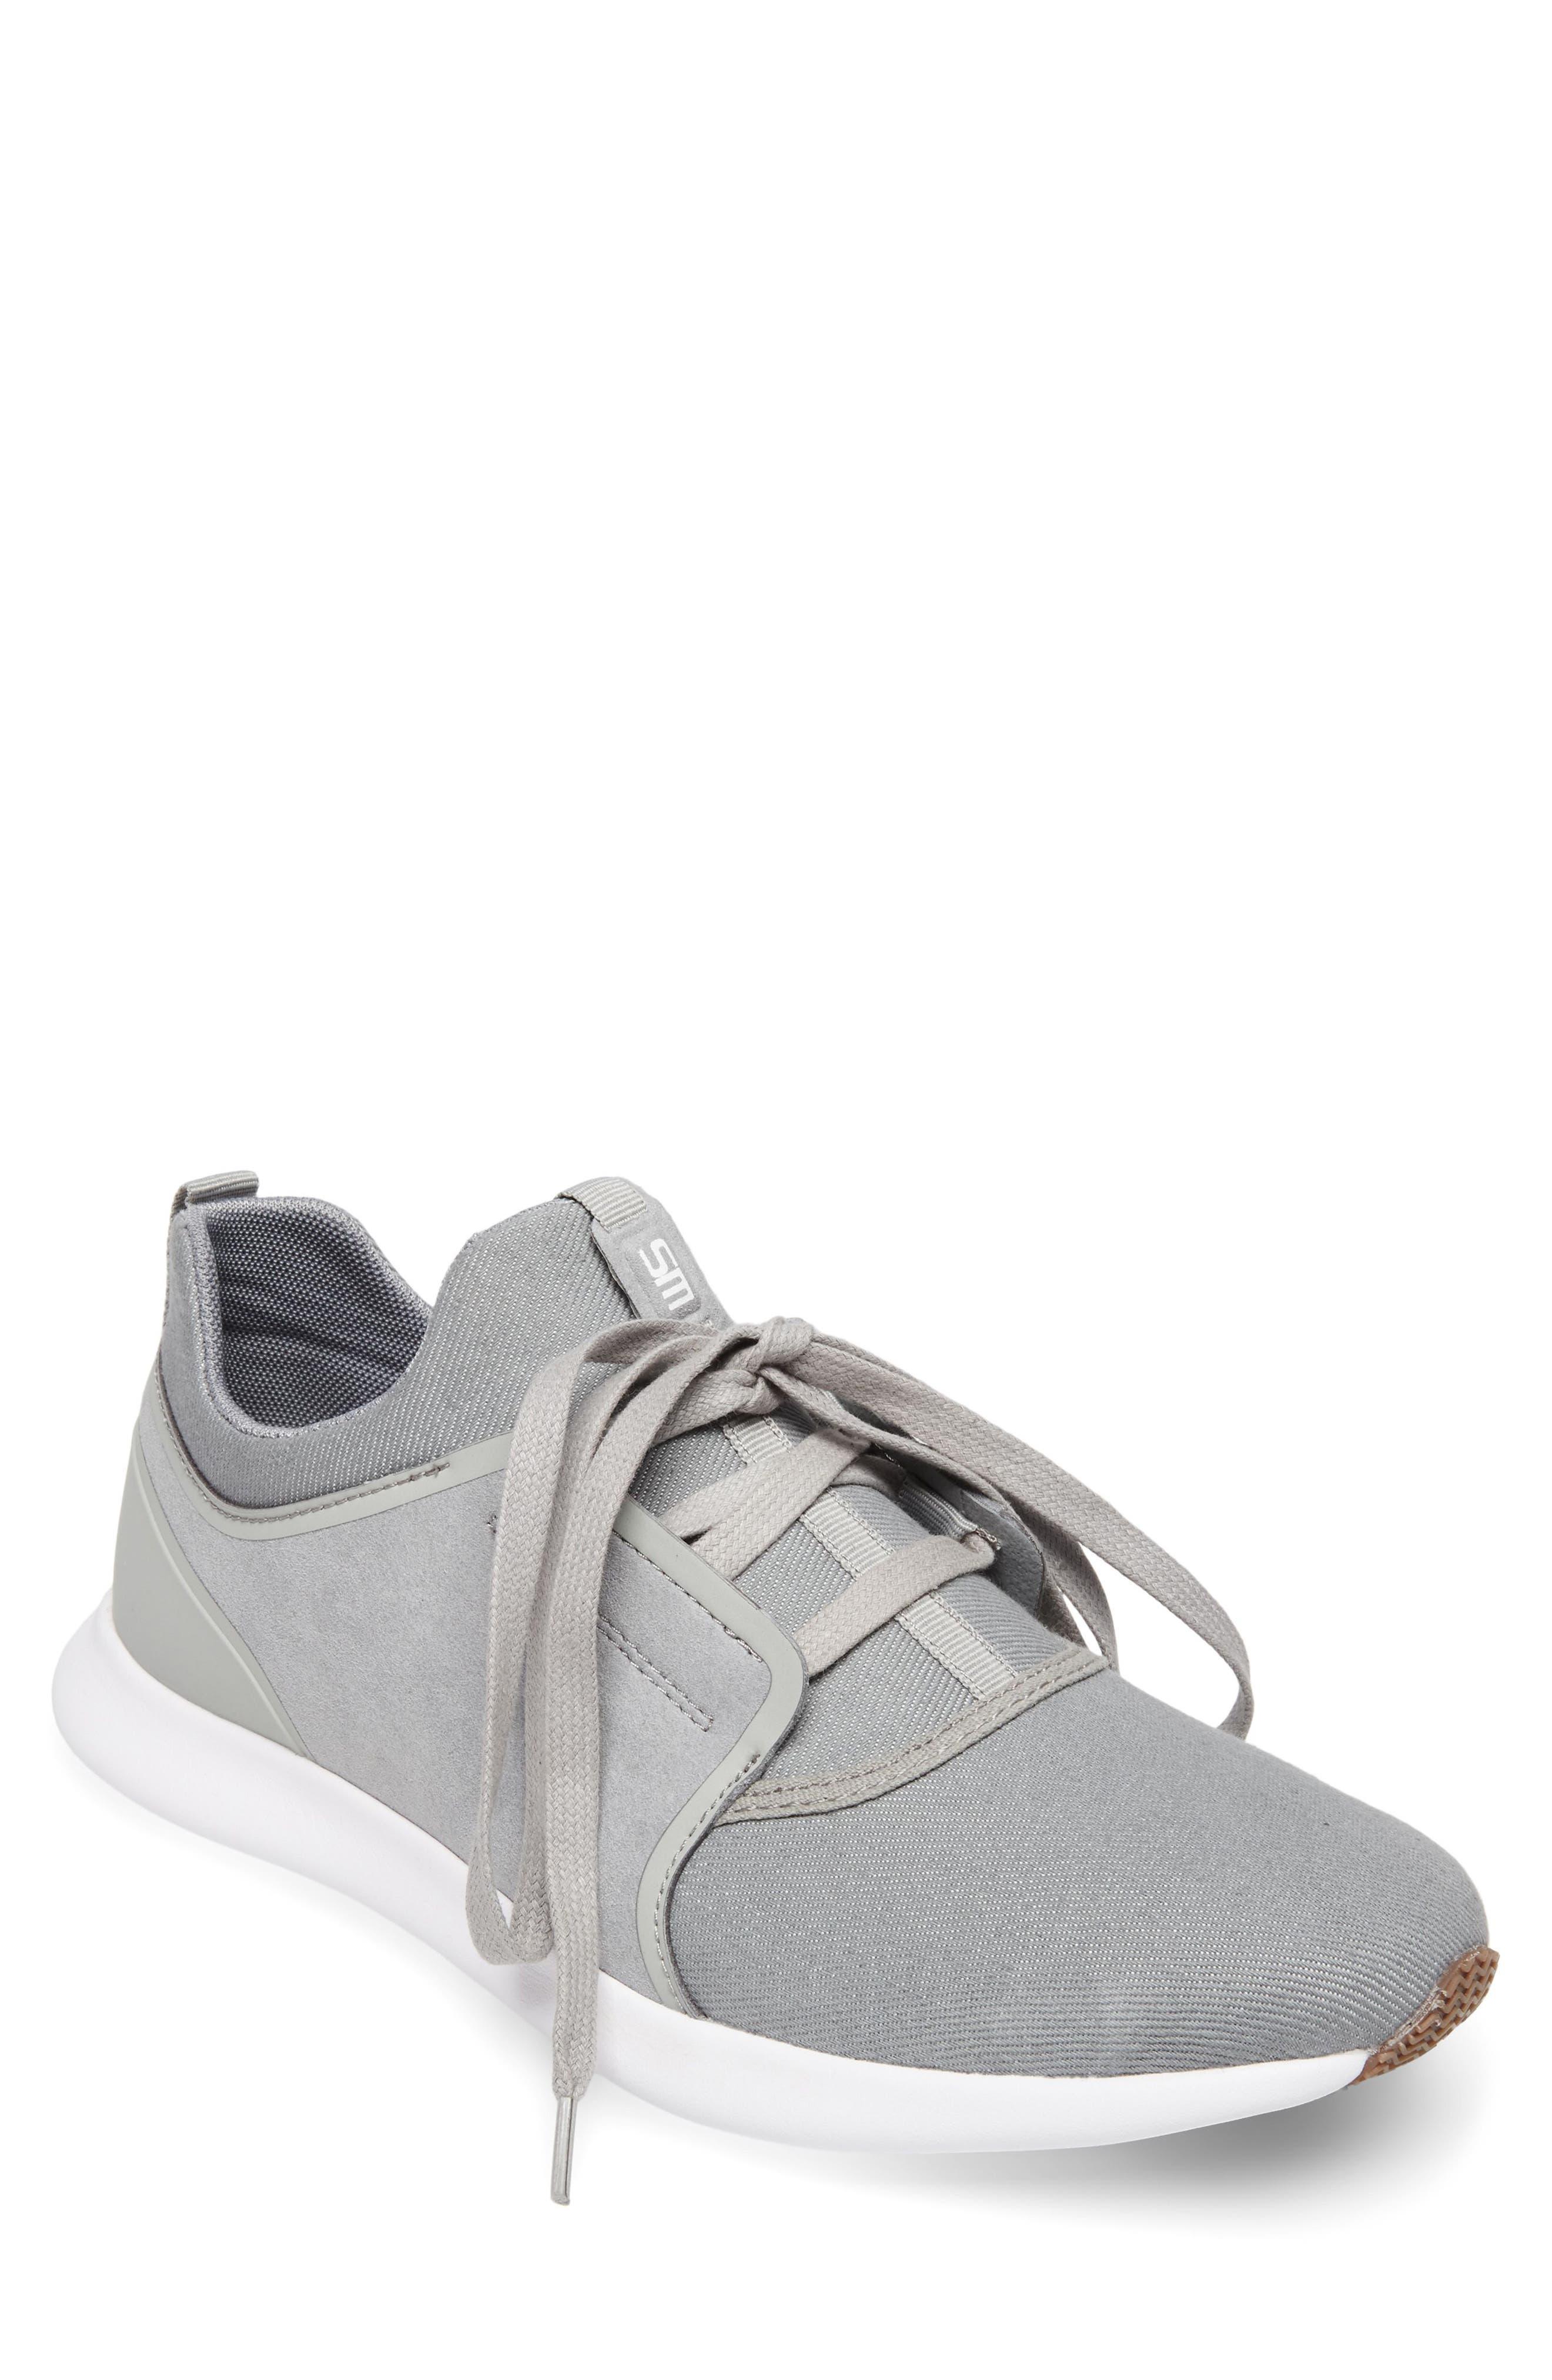 Barrett Sneaker,                         Main,                         color, Grey Leather